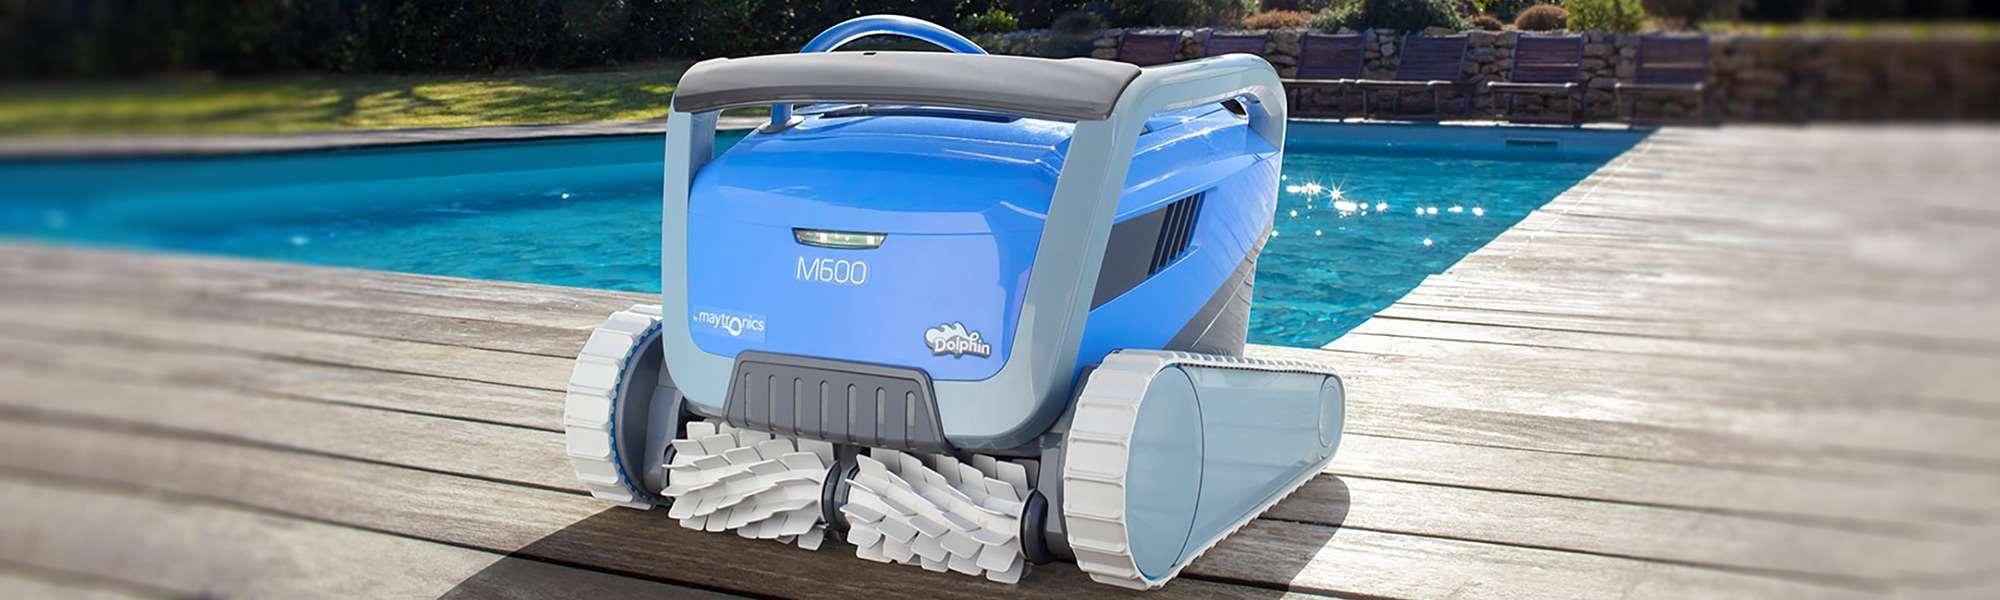 Dolphin m600